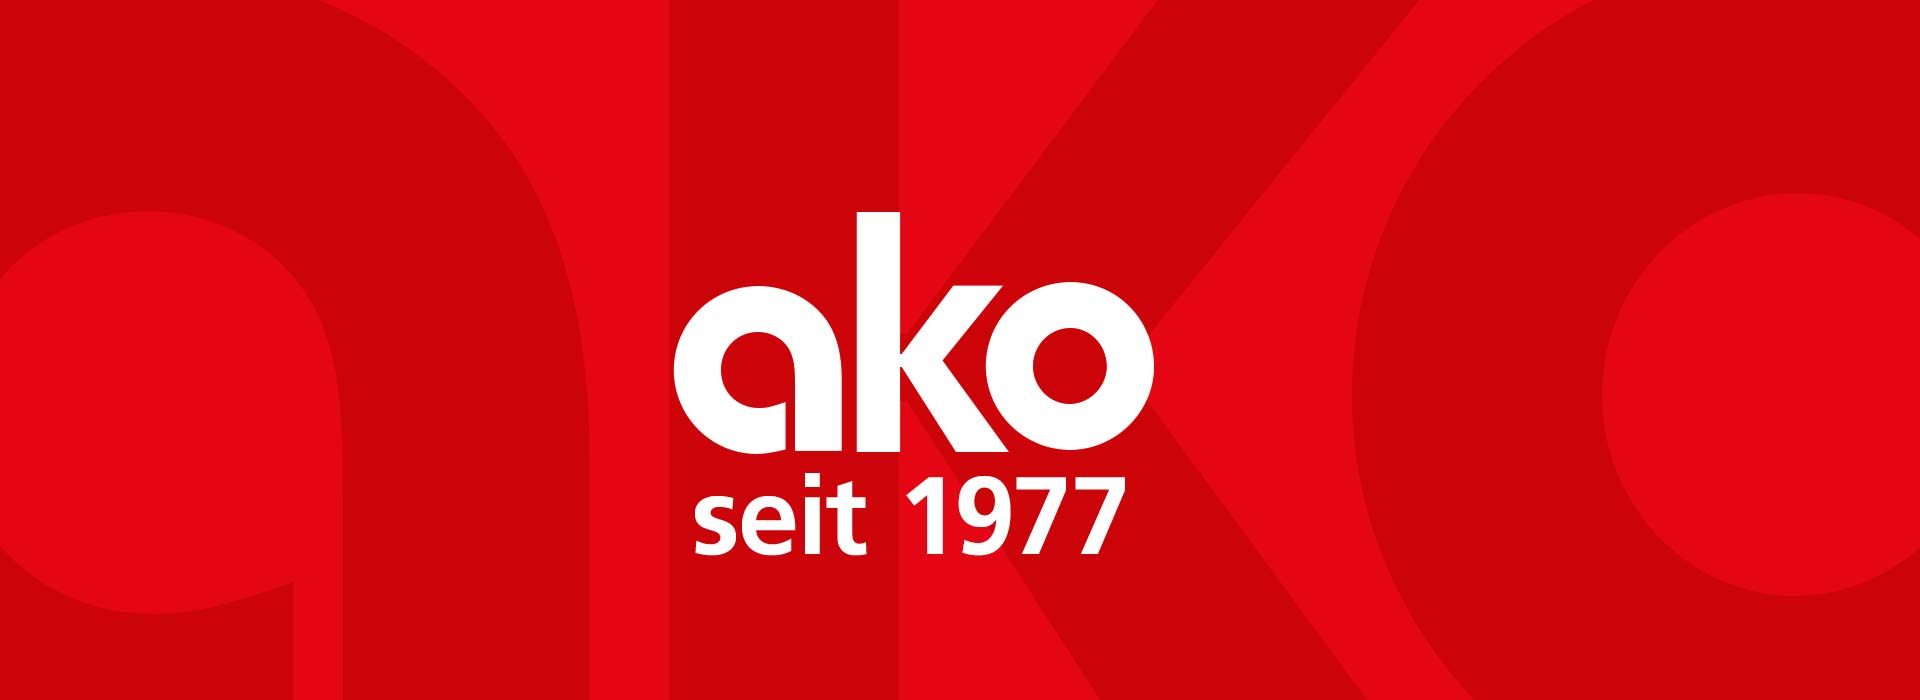 AKO-seit 1977